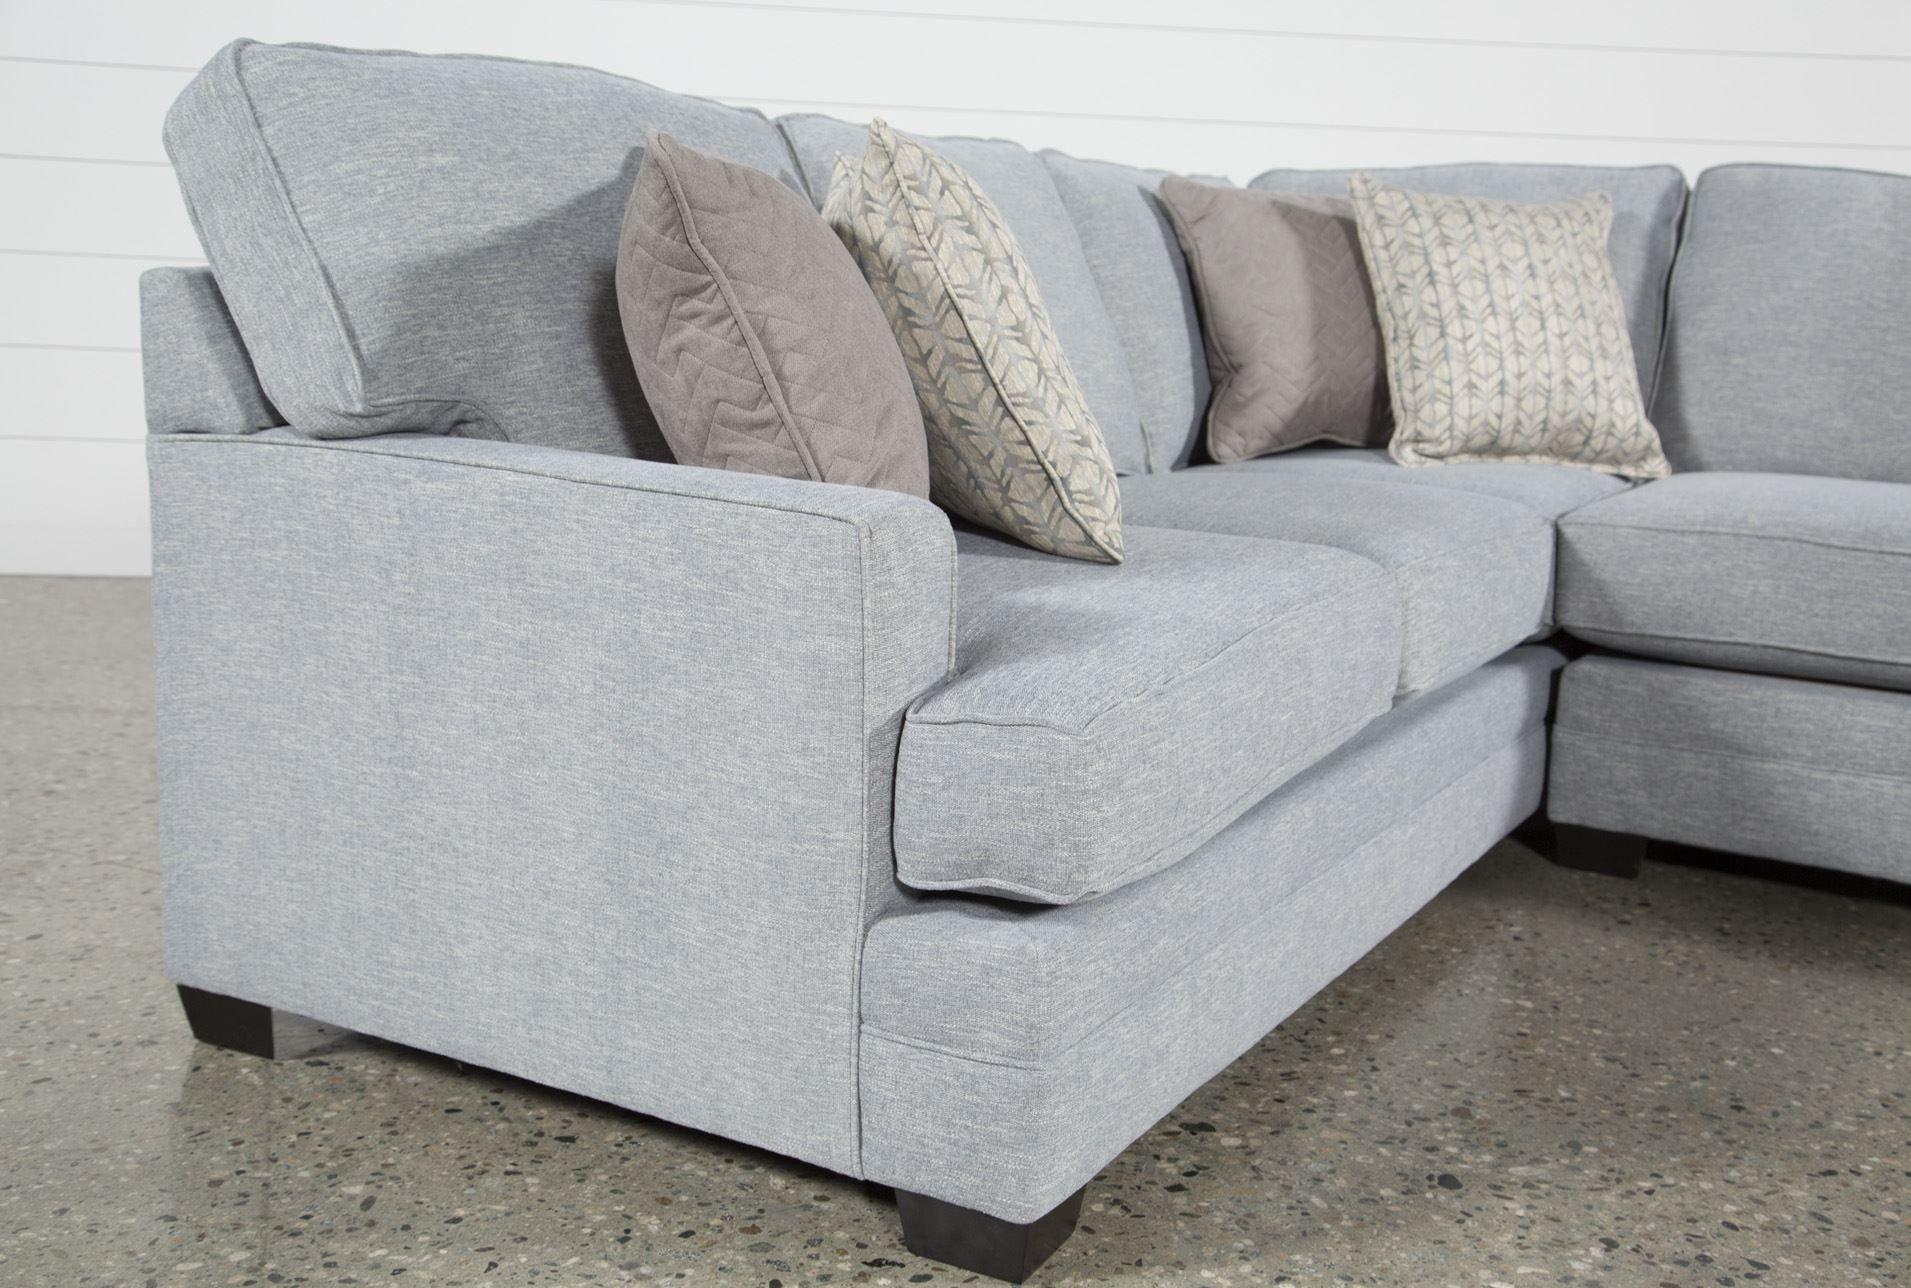 Josephine 2 Piece Sectional W/raf Sofa | Living Spaces | Pinterest in Josephine 2 Piece Sectionals With Laf Sofa (Image 15 of 30)